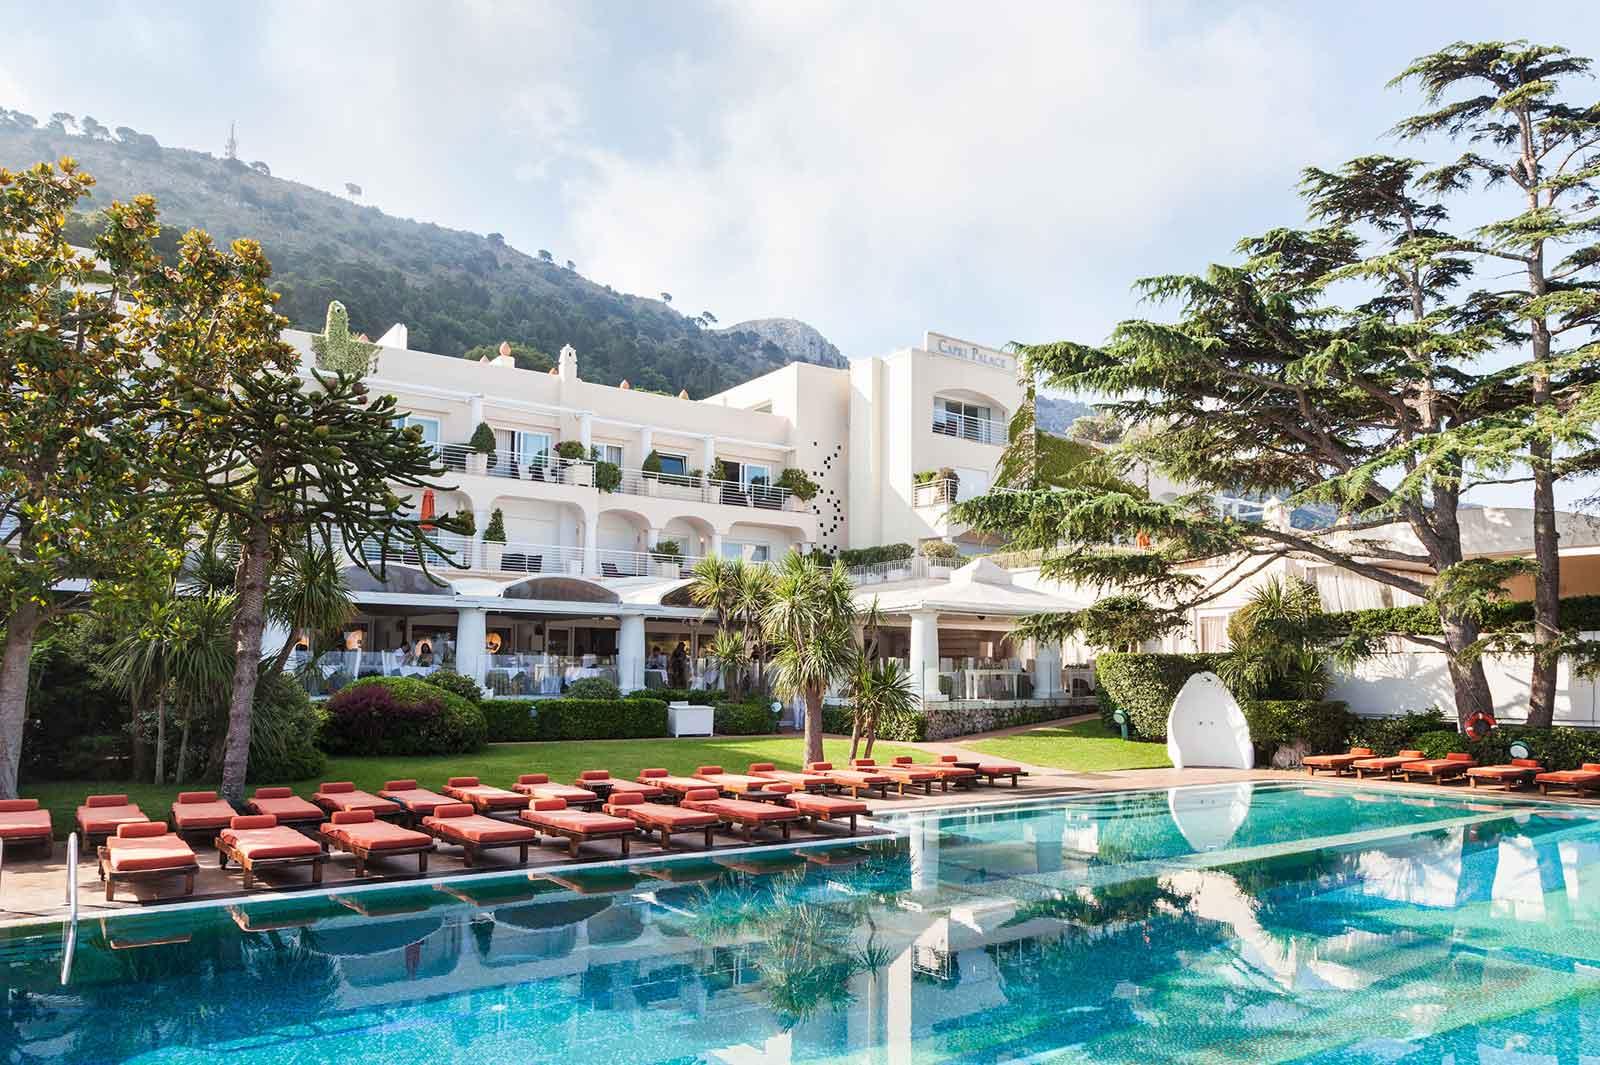 Piscine du Capri Palace Hotel, Anacapri Italie